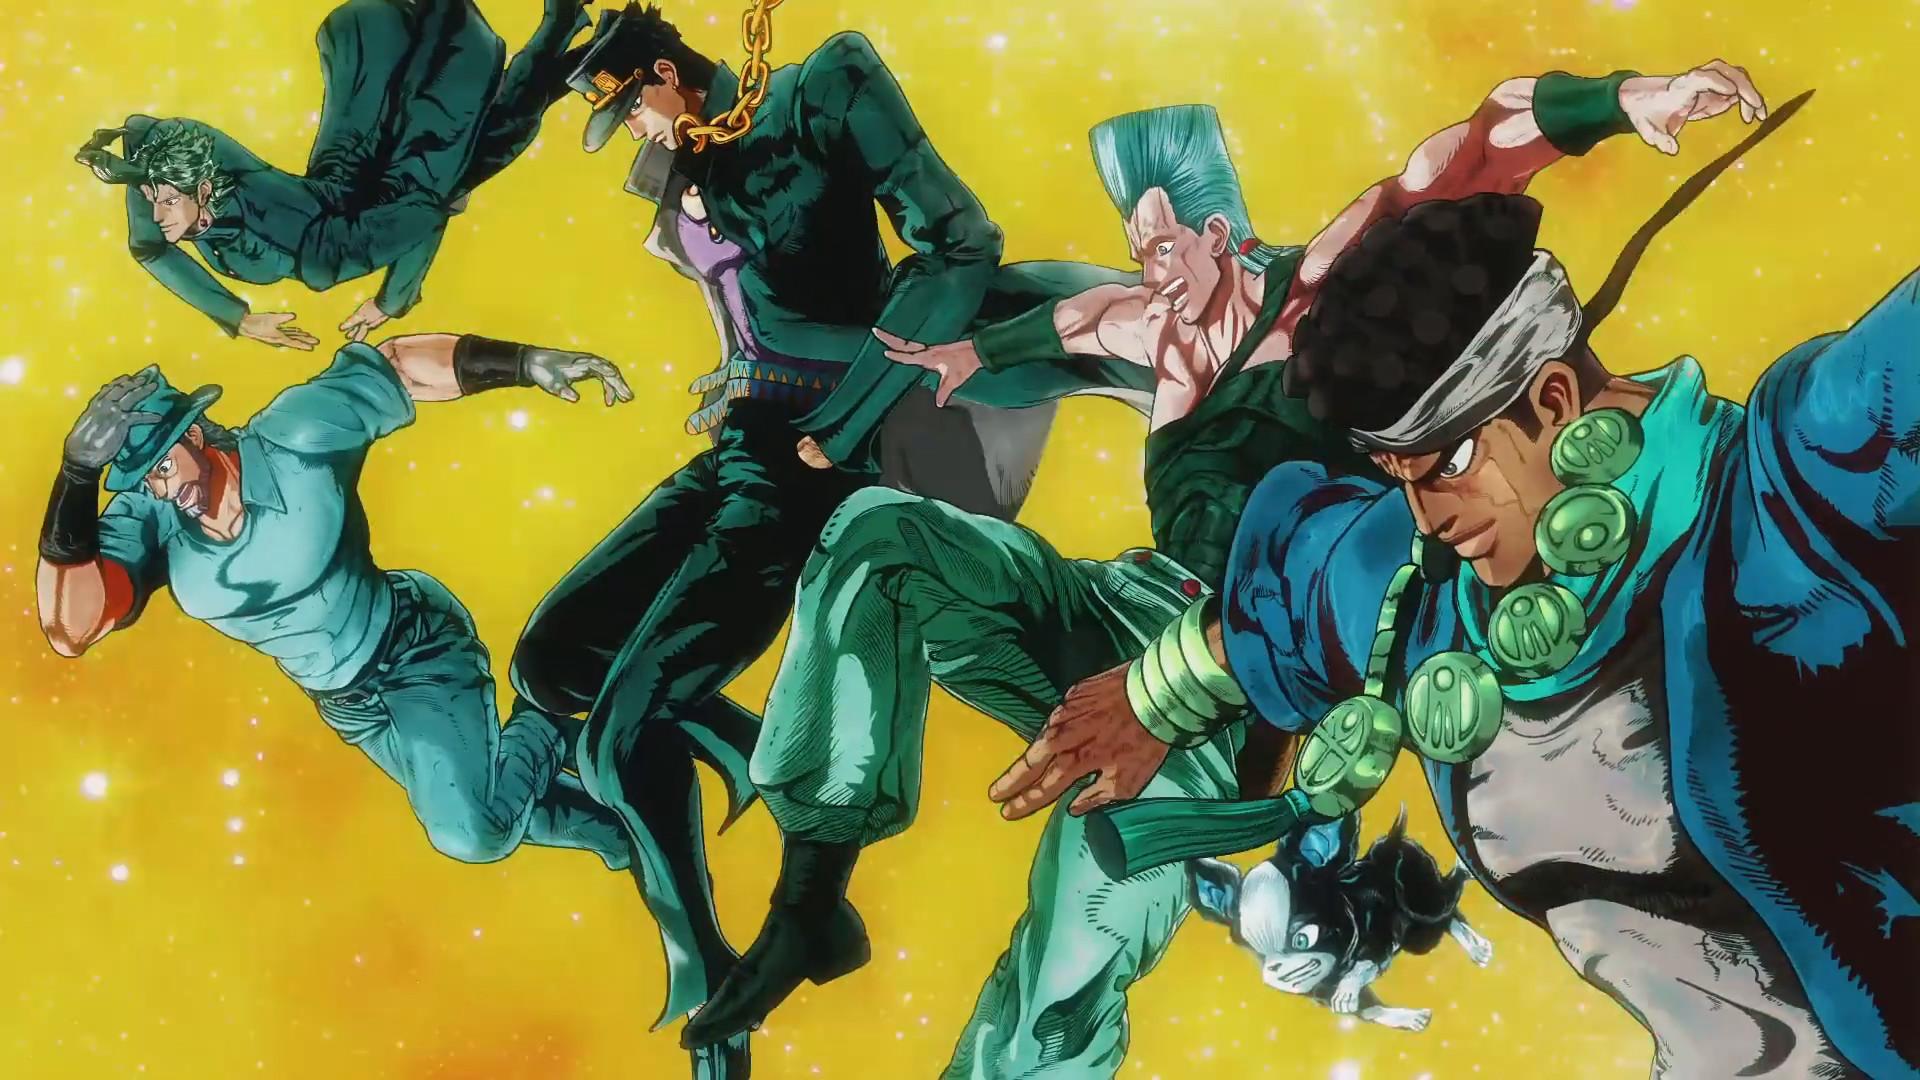 Anime – Jojo's Bizarre Adventure Bakgrund